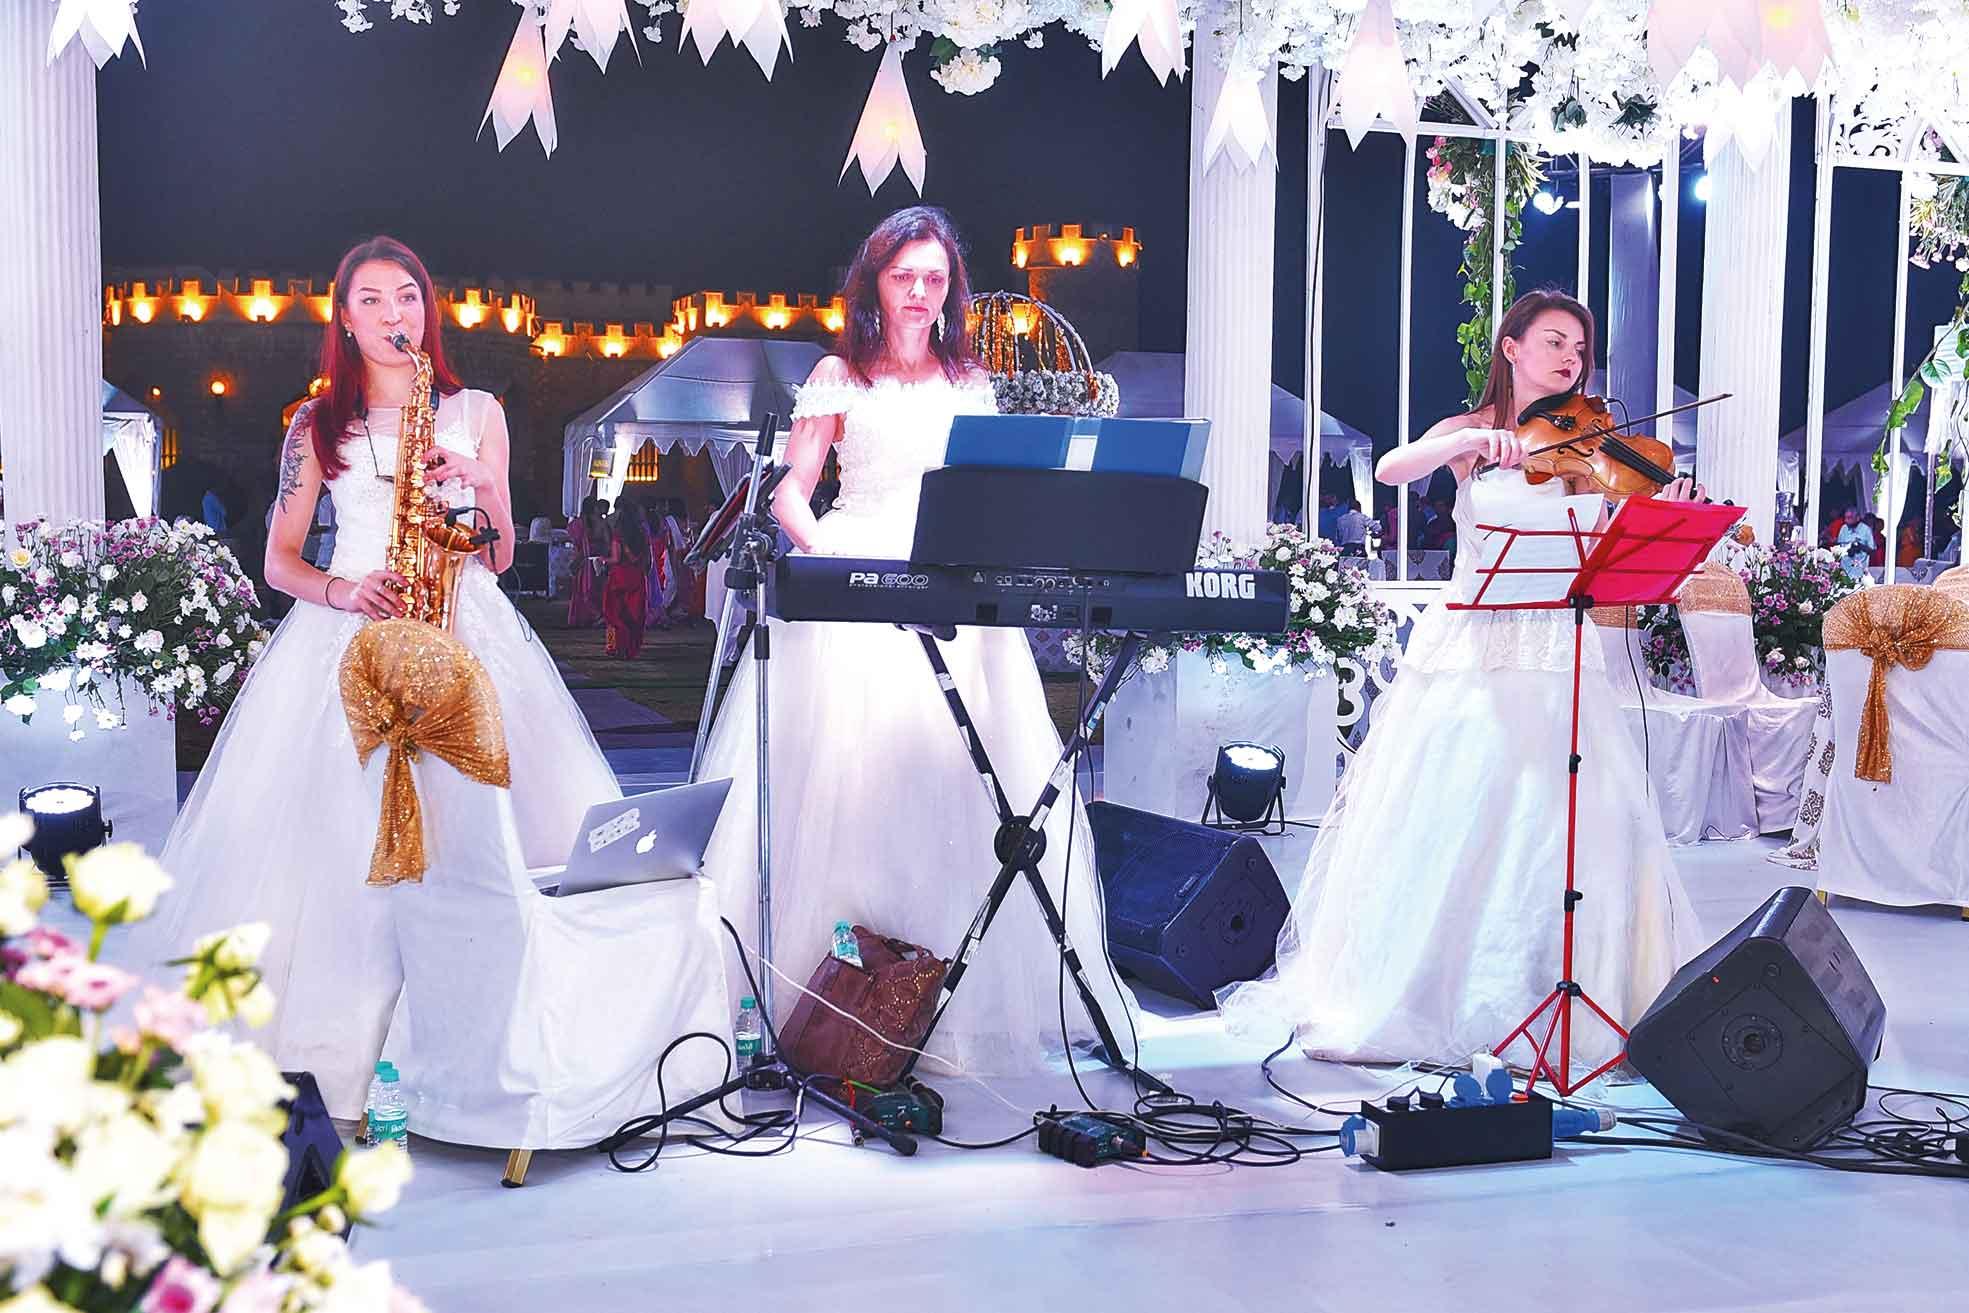 pg3-wedding4